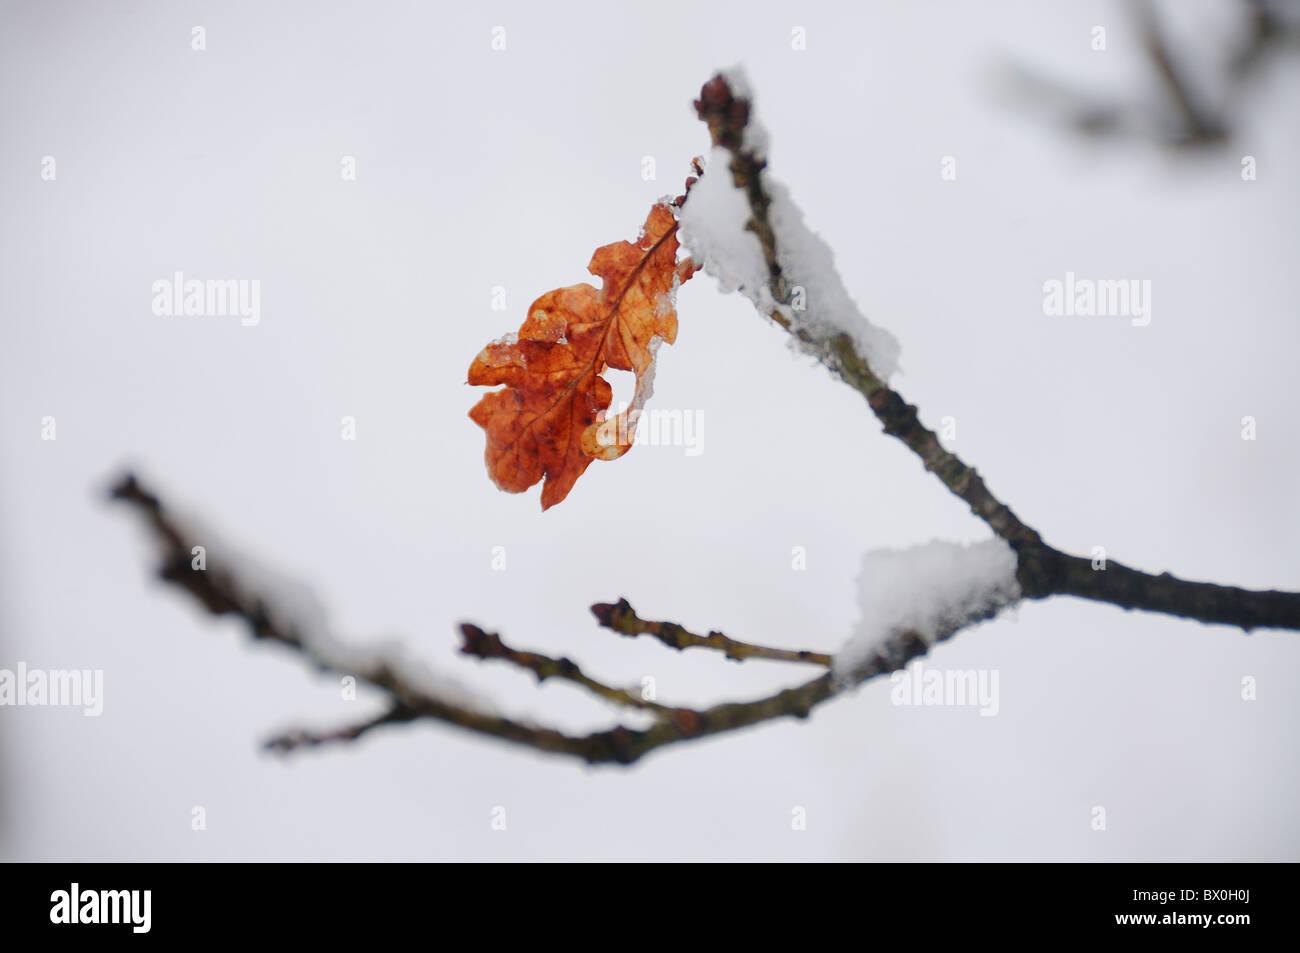 Autumn oak leaf in snow - Stock Image